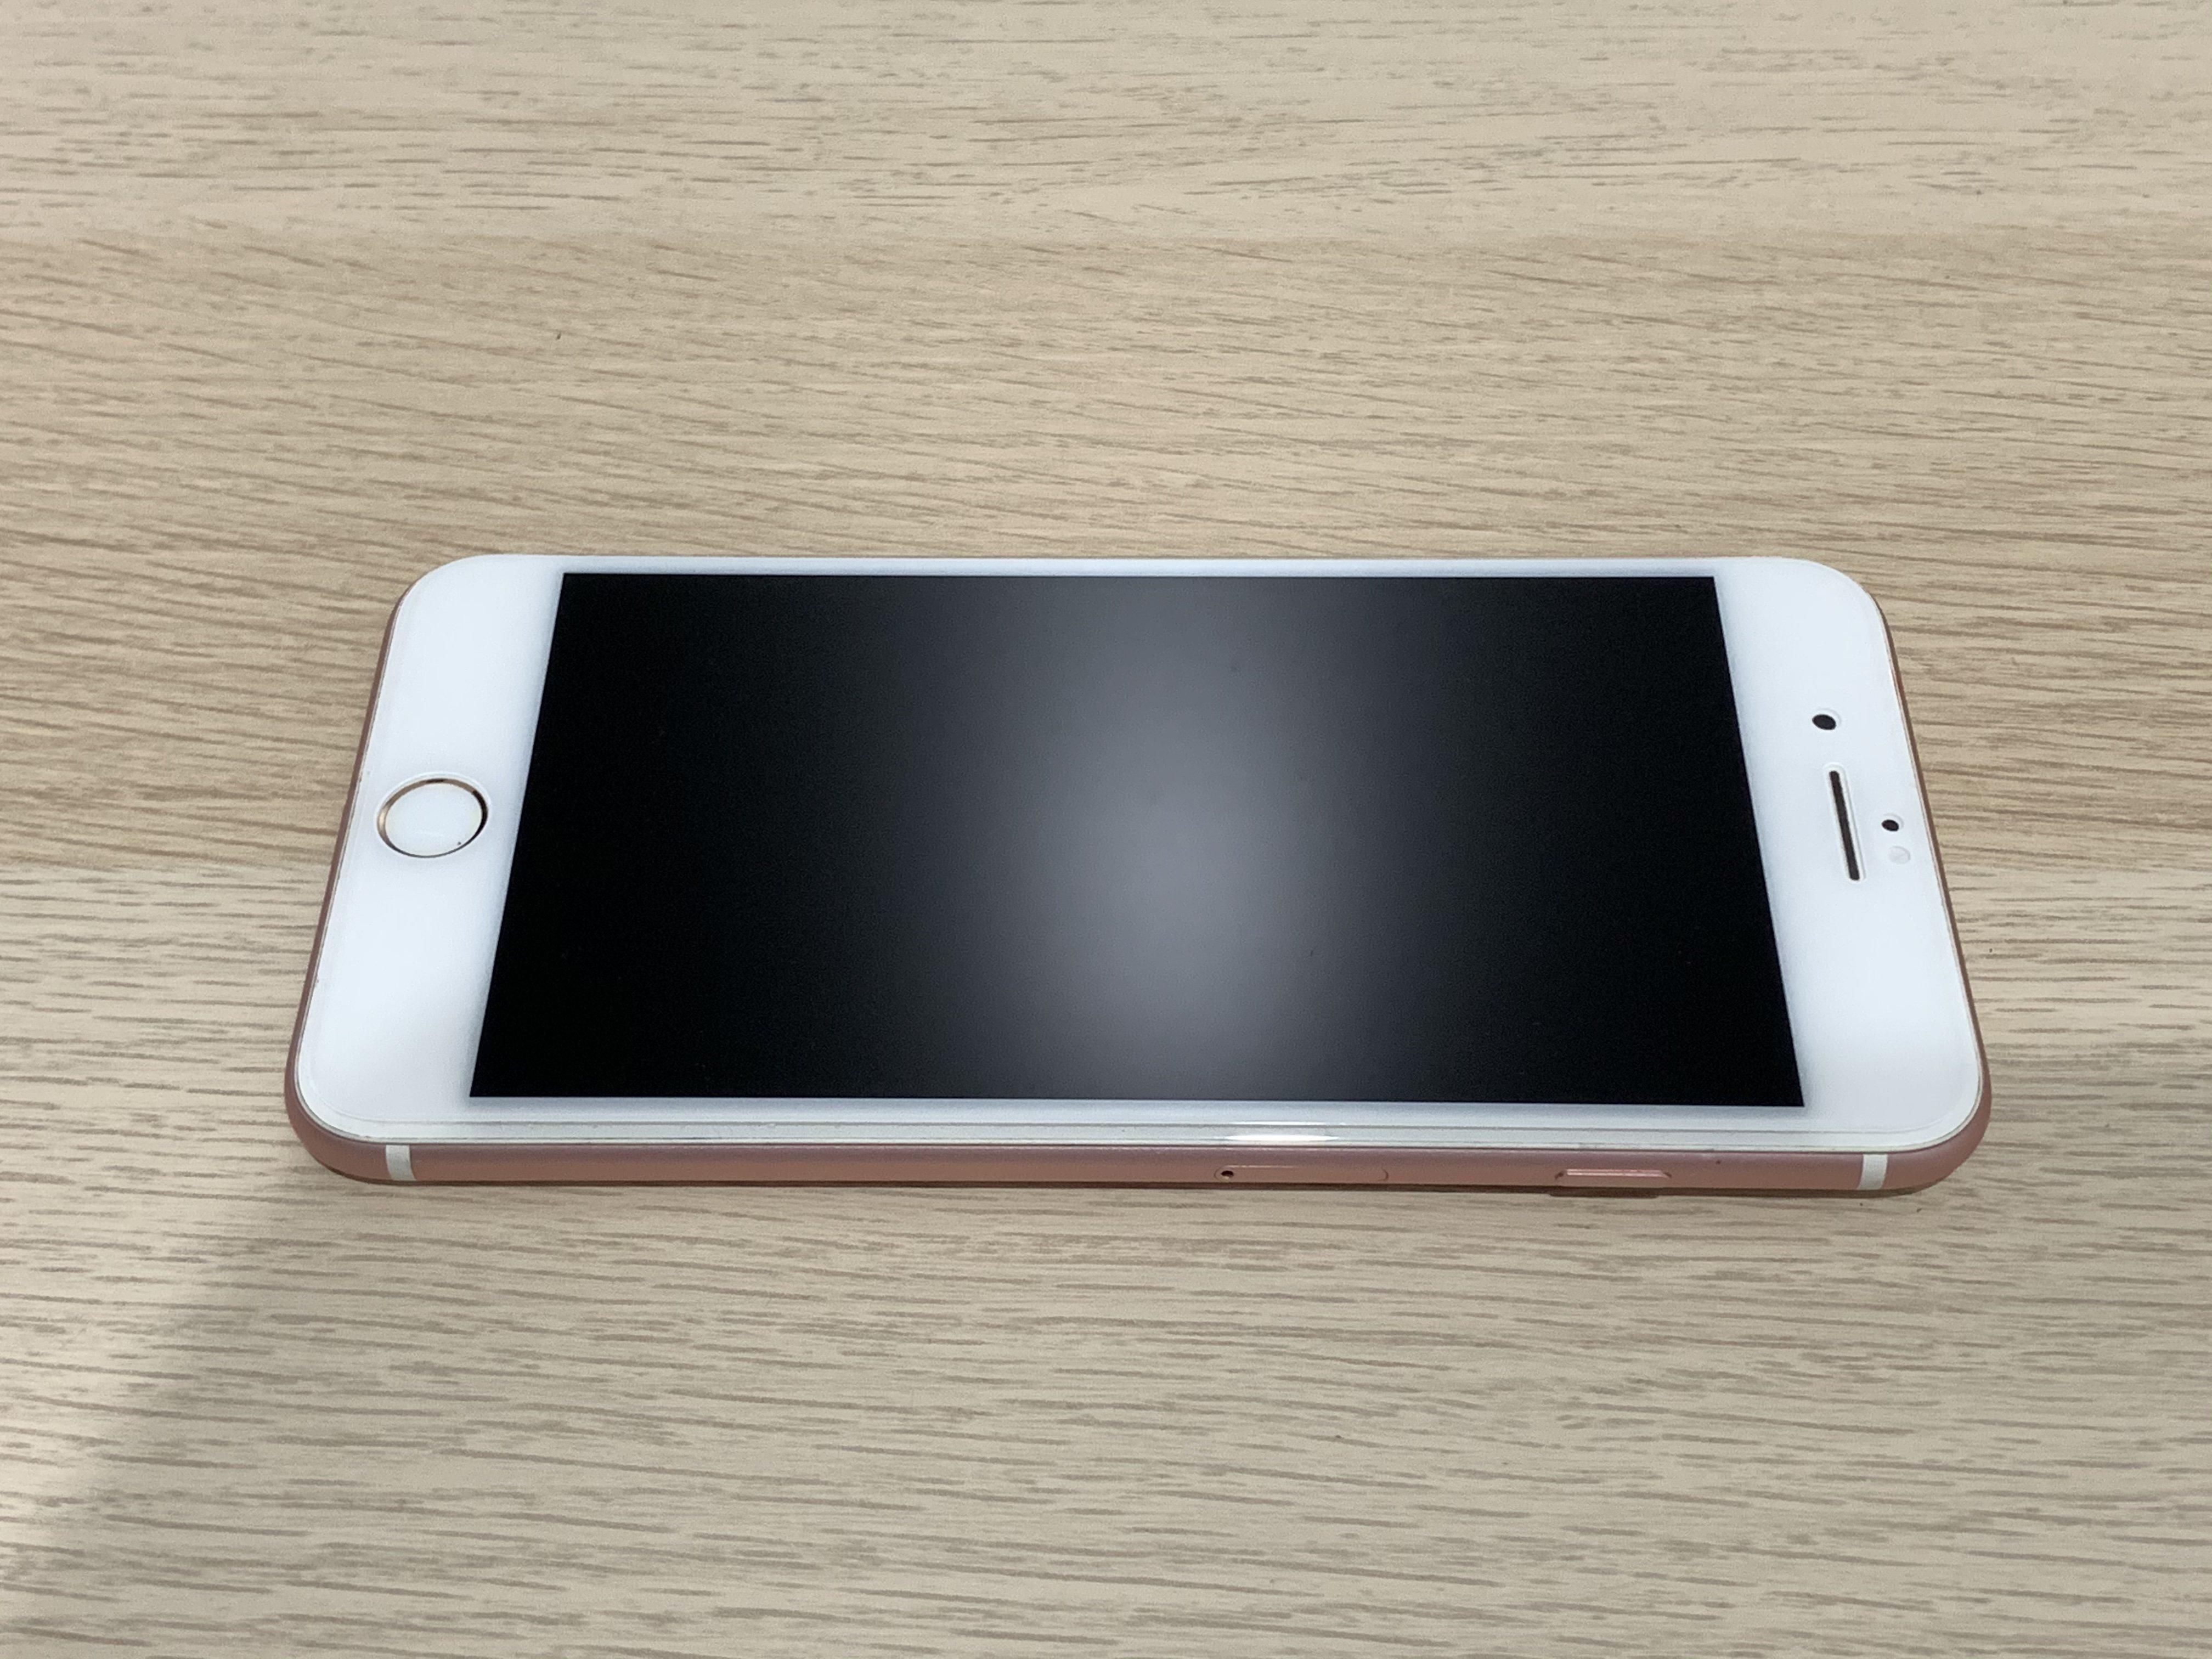 二手 iPhone 7 Plus 128G 玫瑰金